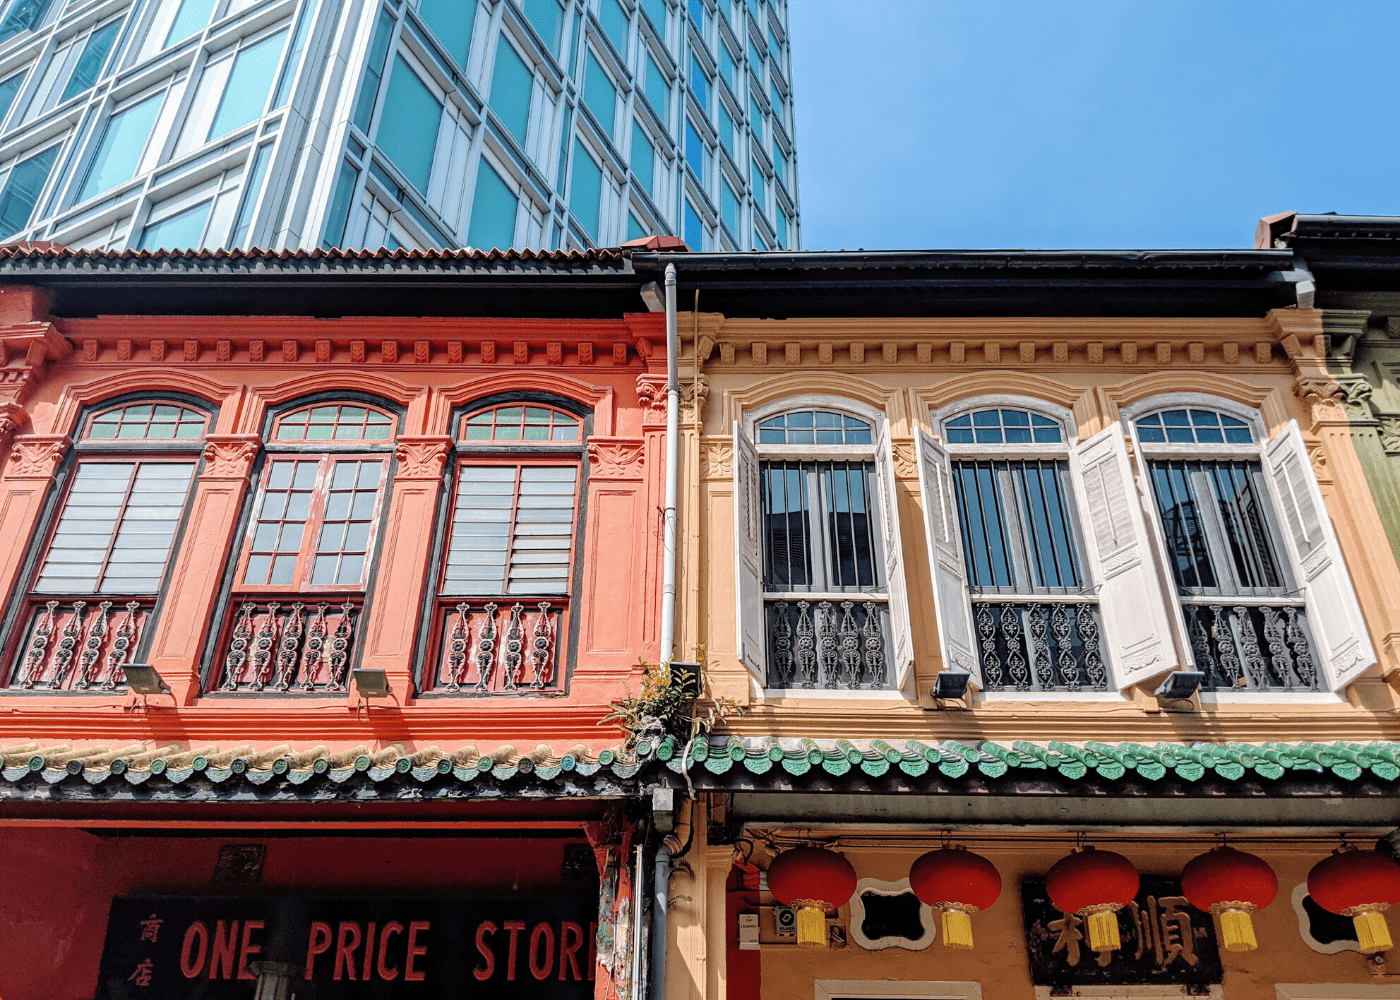 Bars along Emerald Hill Singapore | Guide to Emerald Hill